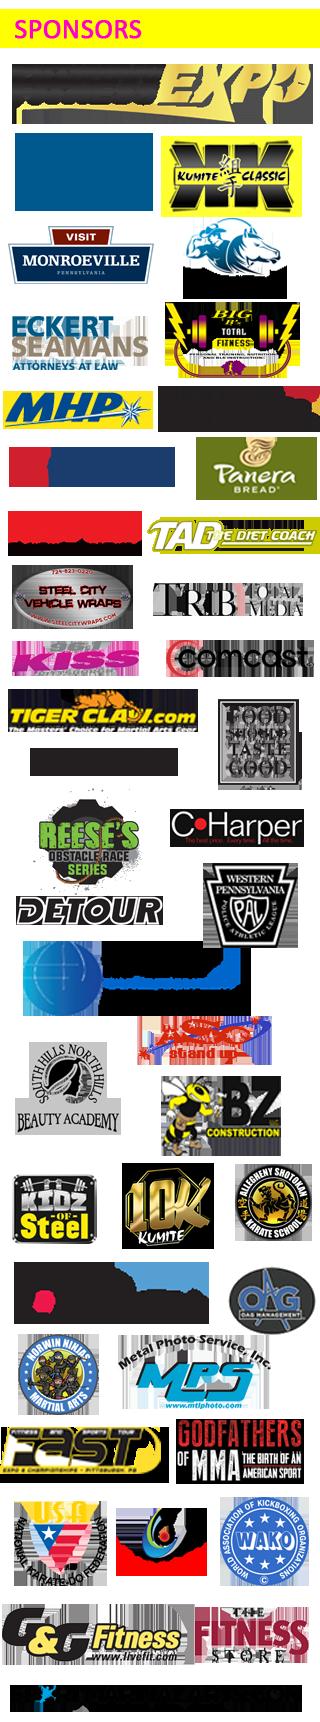 pittsburgh fitness expo sponsors